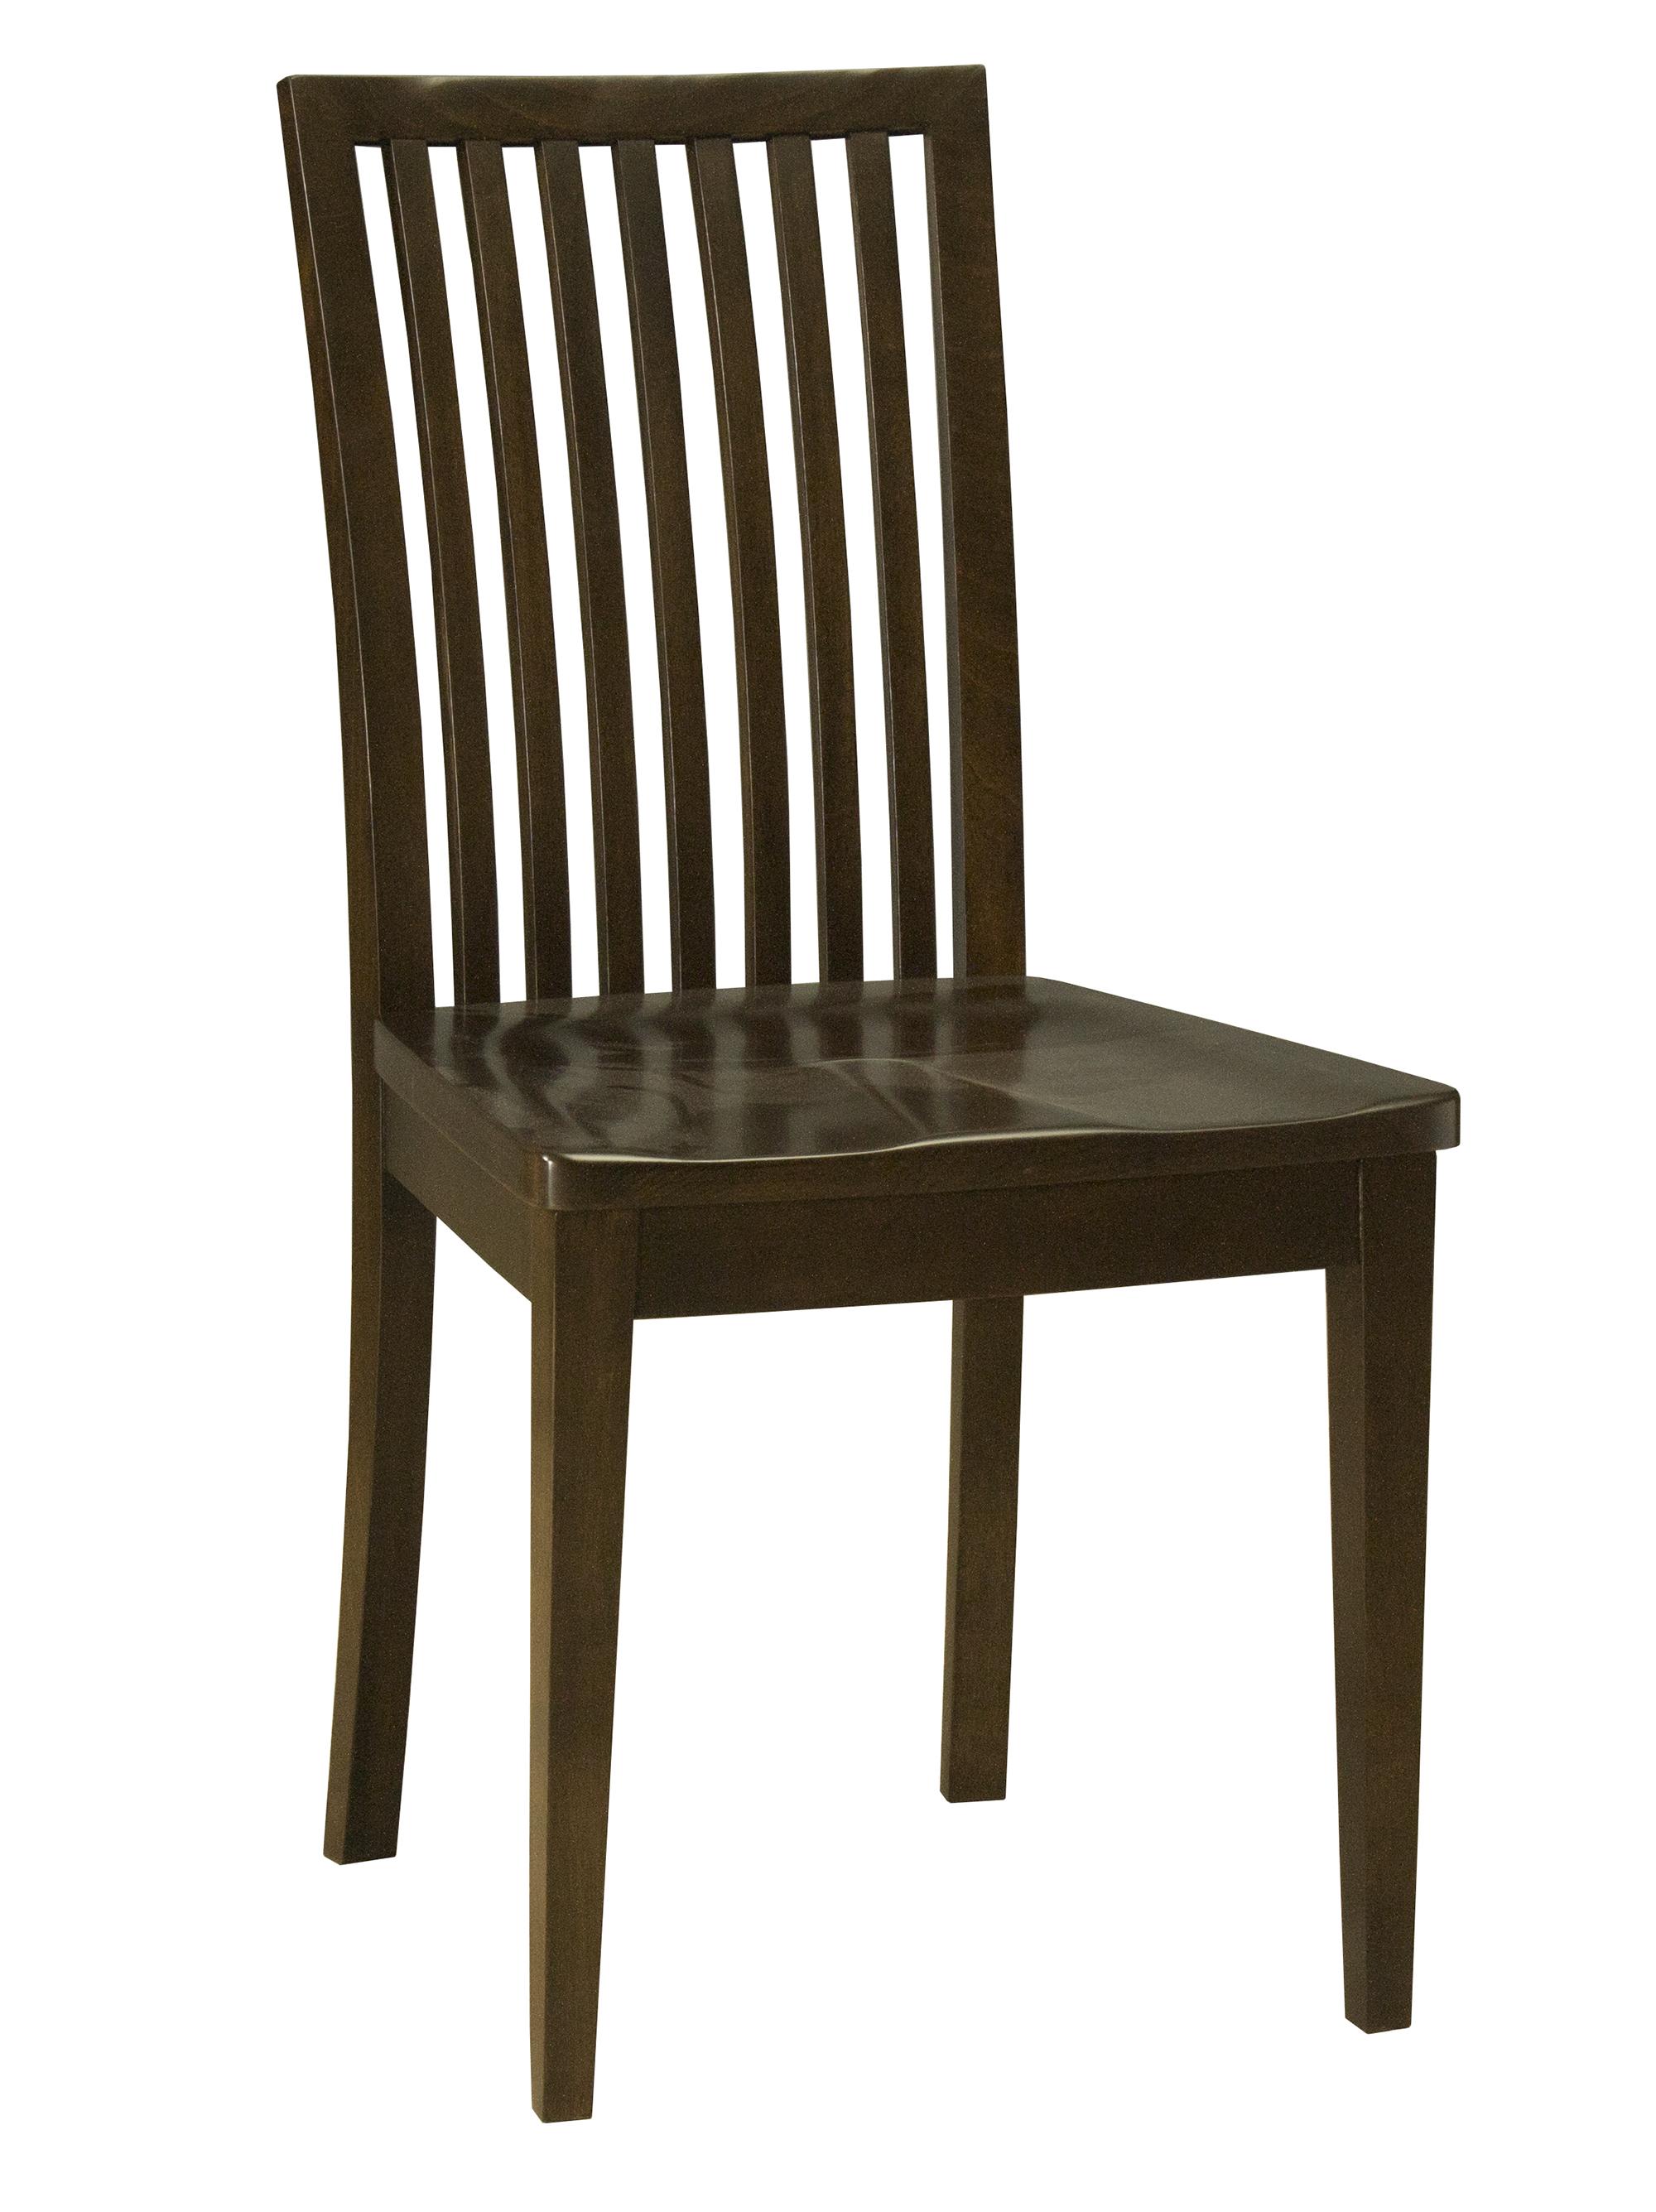 Model 24 Side Chair Wood Seat Saloom Furniture Company